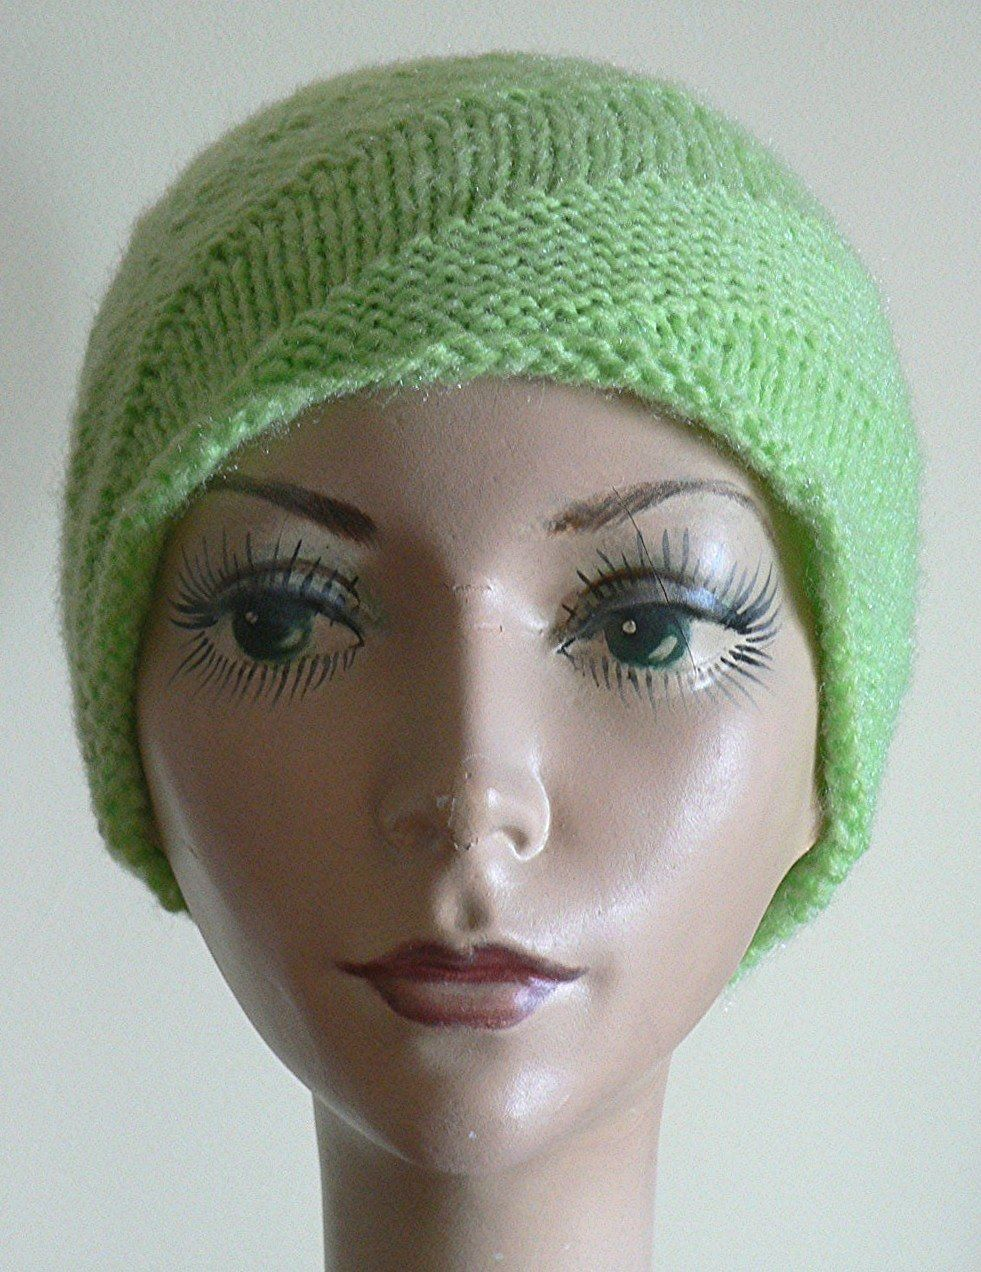 spiral knit hat | Knitting, Hat knitting patterns ...